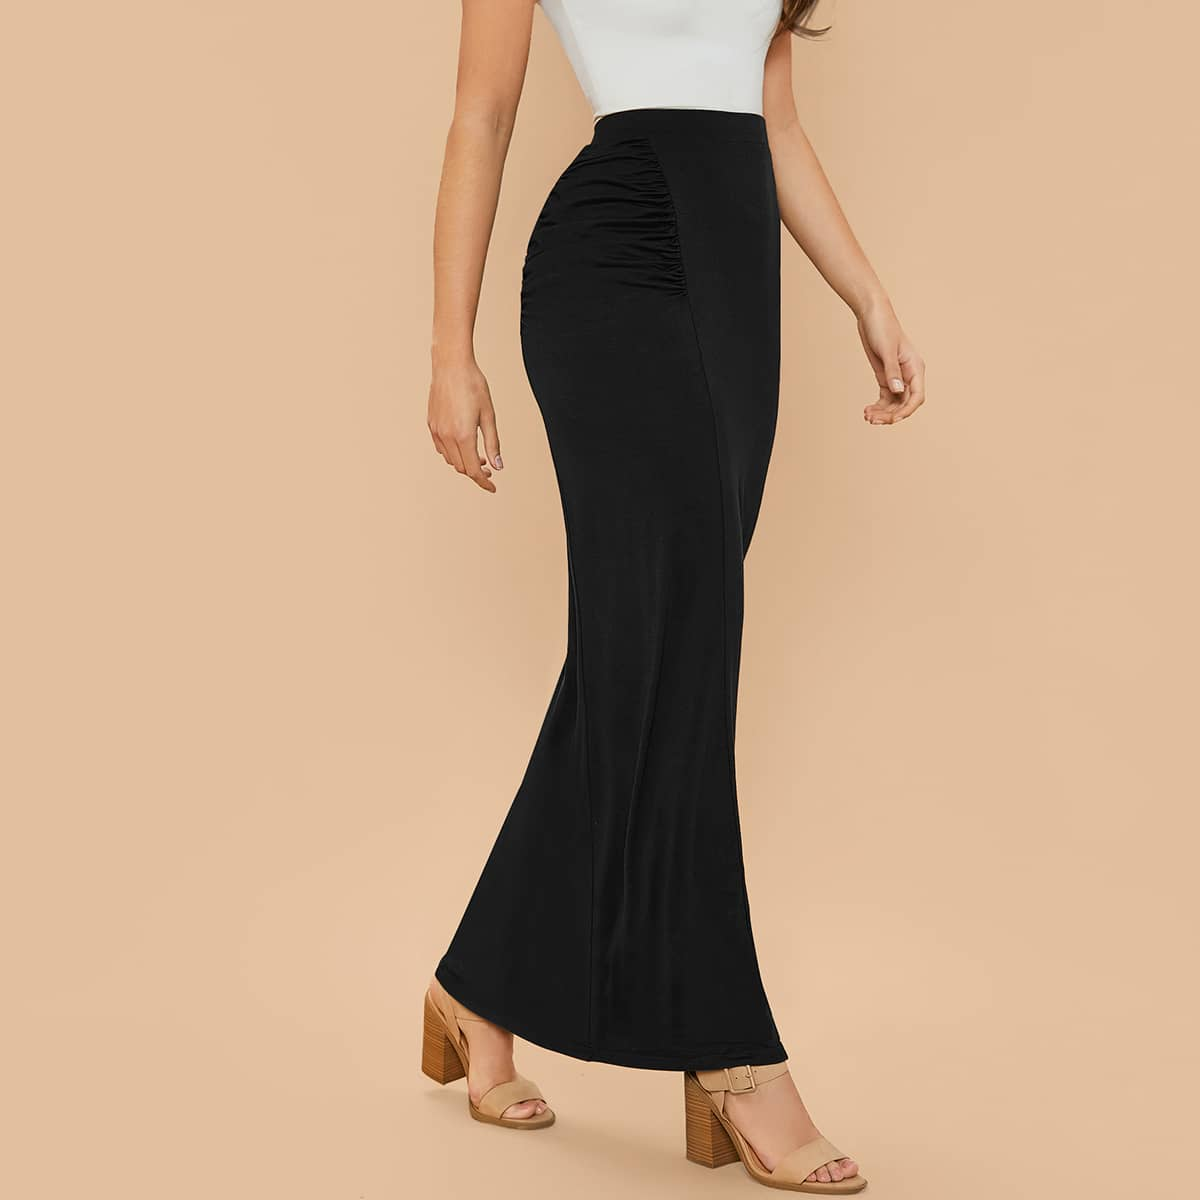 SHEIN / Ruched Detail Maxi Skirt